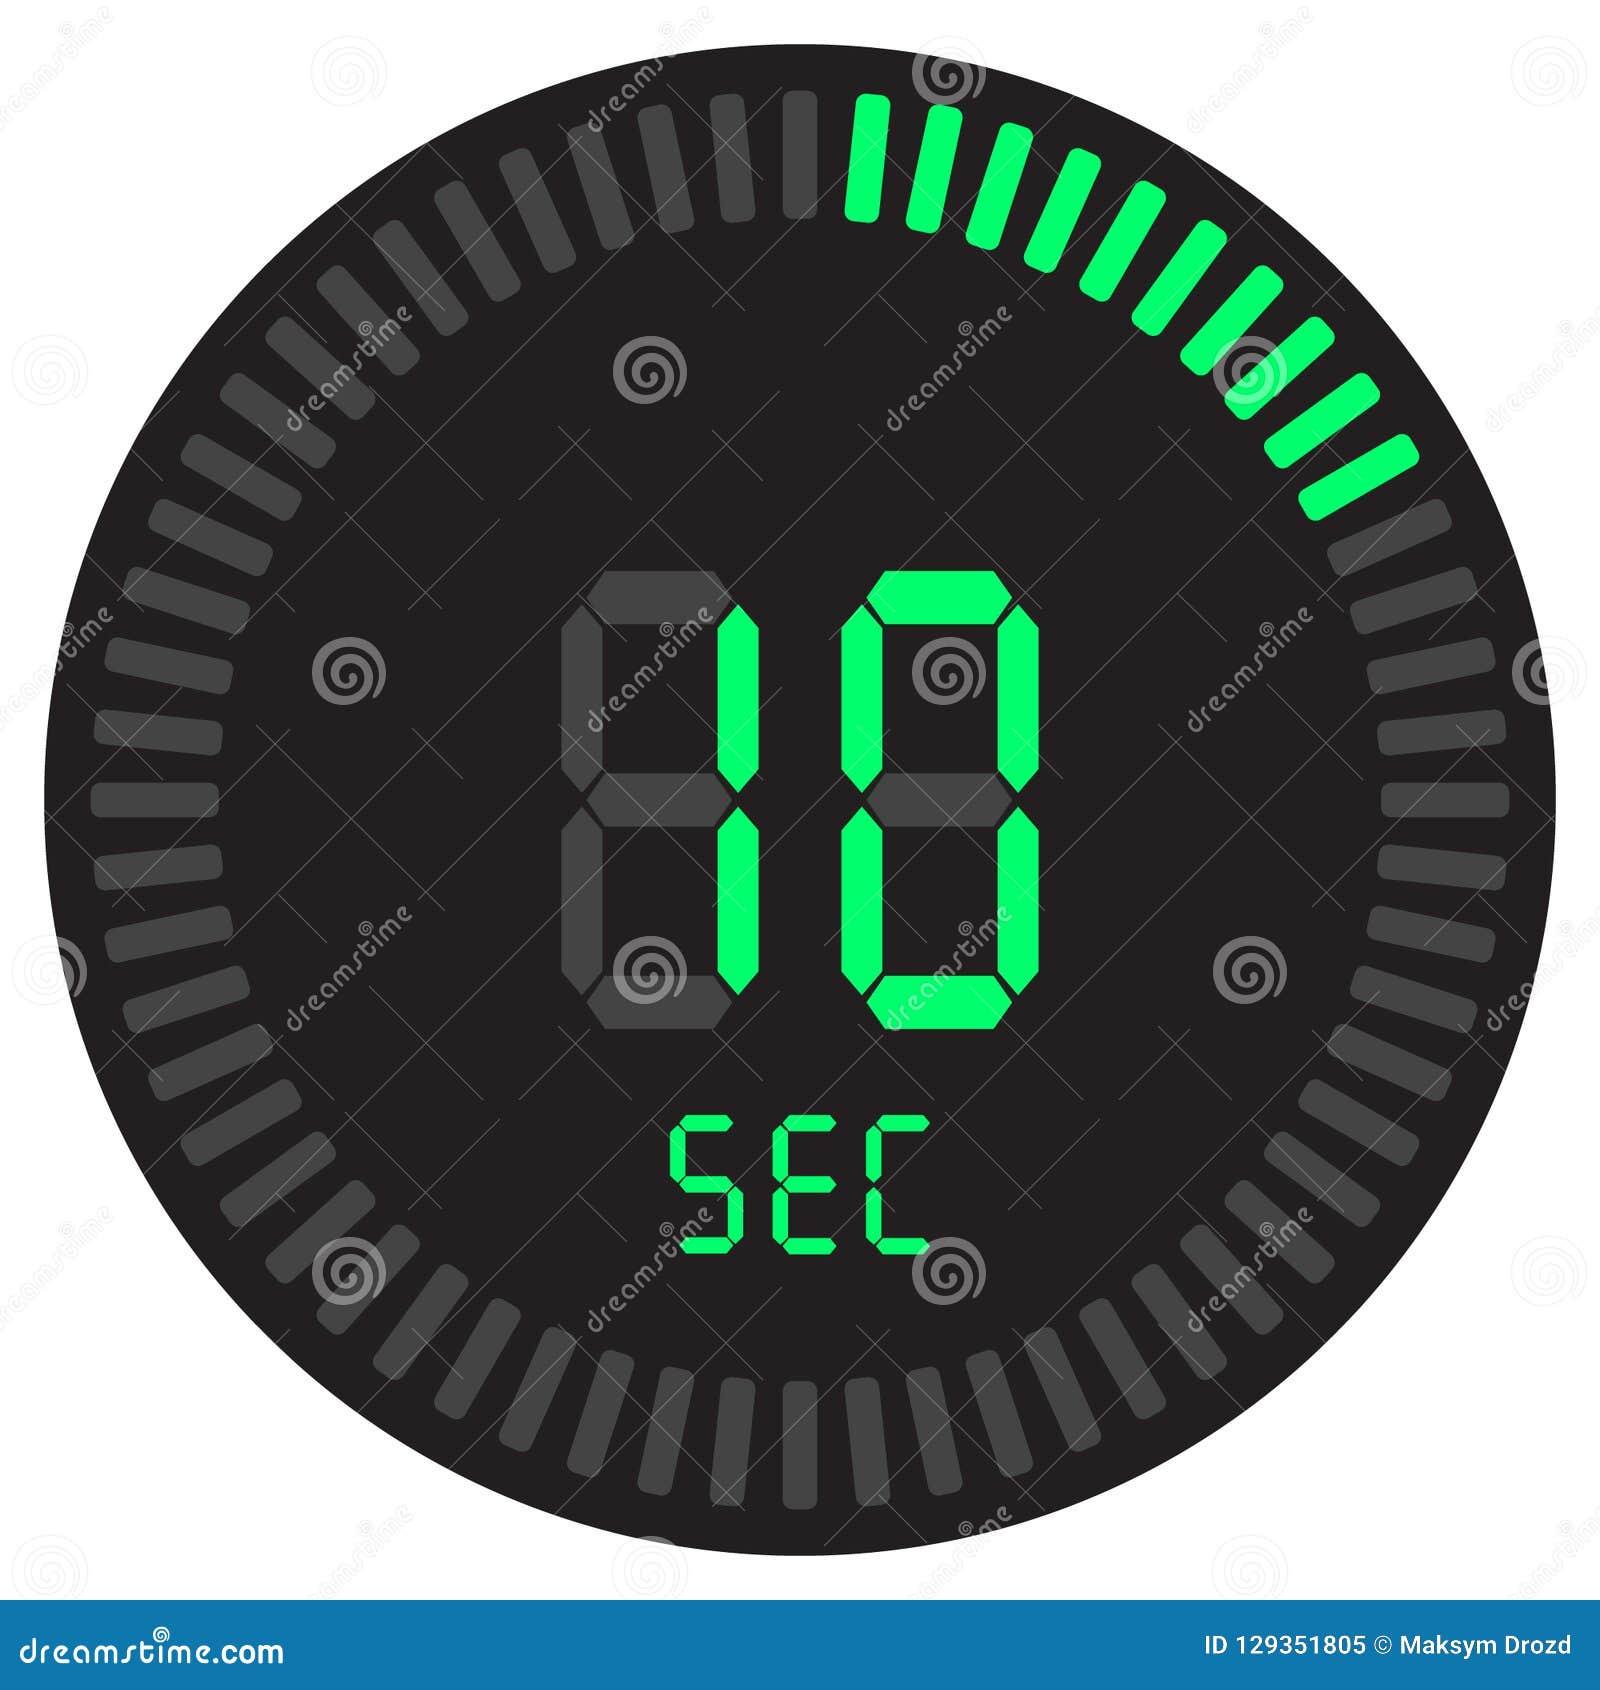 Цифровой таймер 10 секунд электронный секундомер при шкала градиента начиная значок вектора, часы и вахту, таймер, комплекс предп